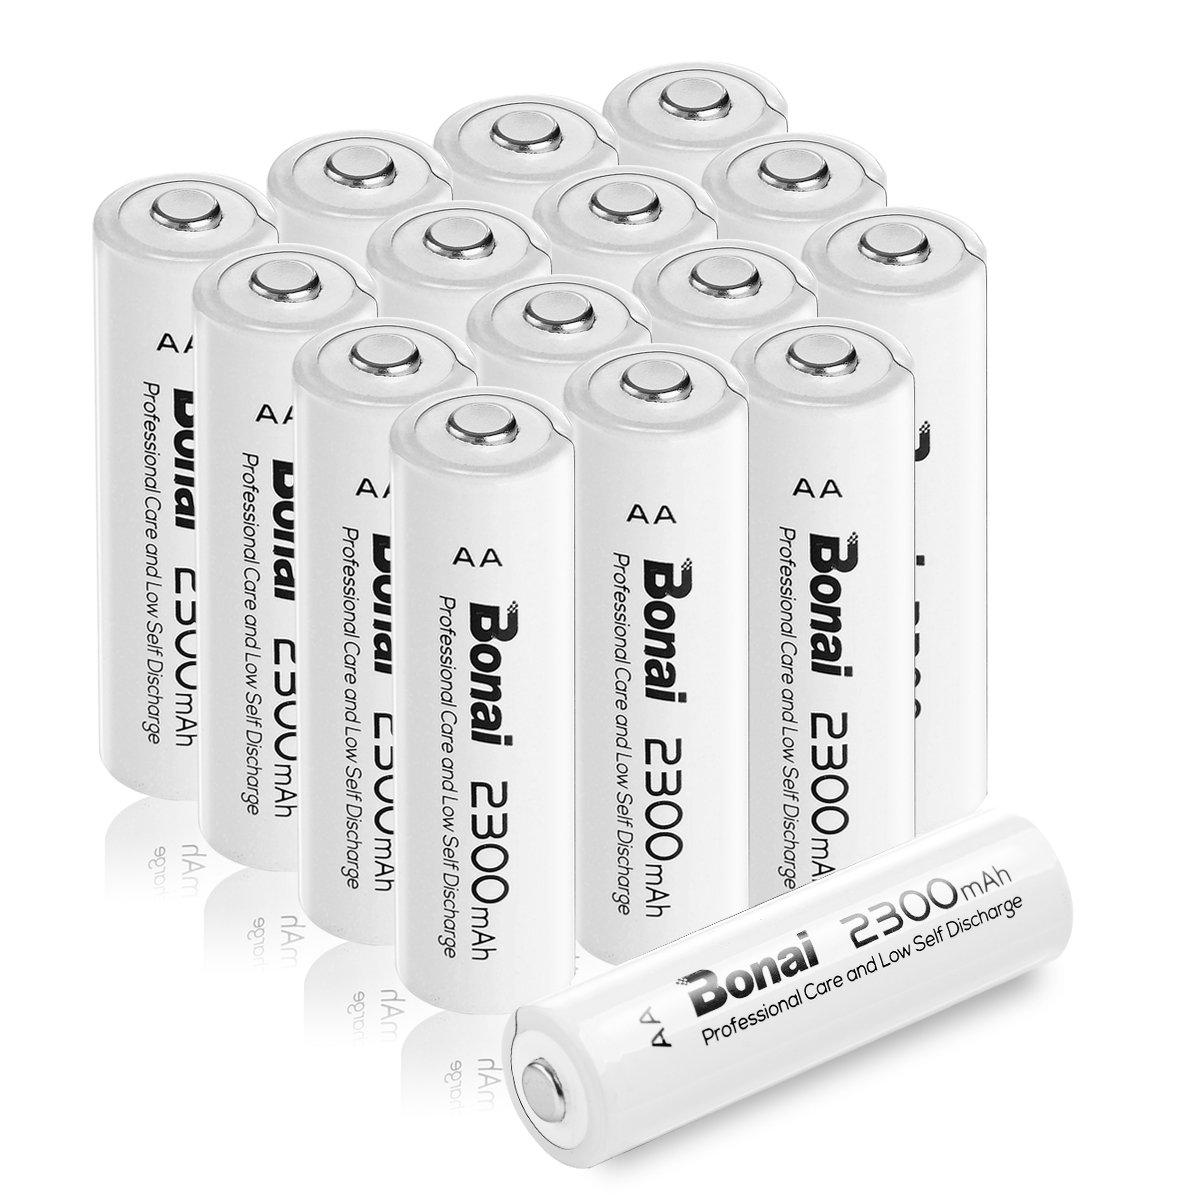 BONAI 16+2 Charger and AA Battery